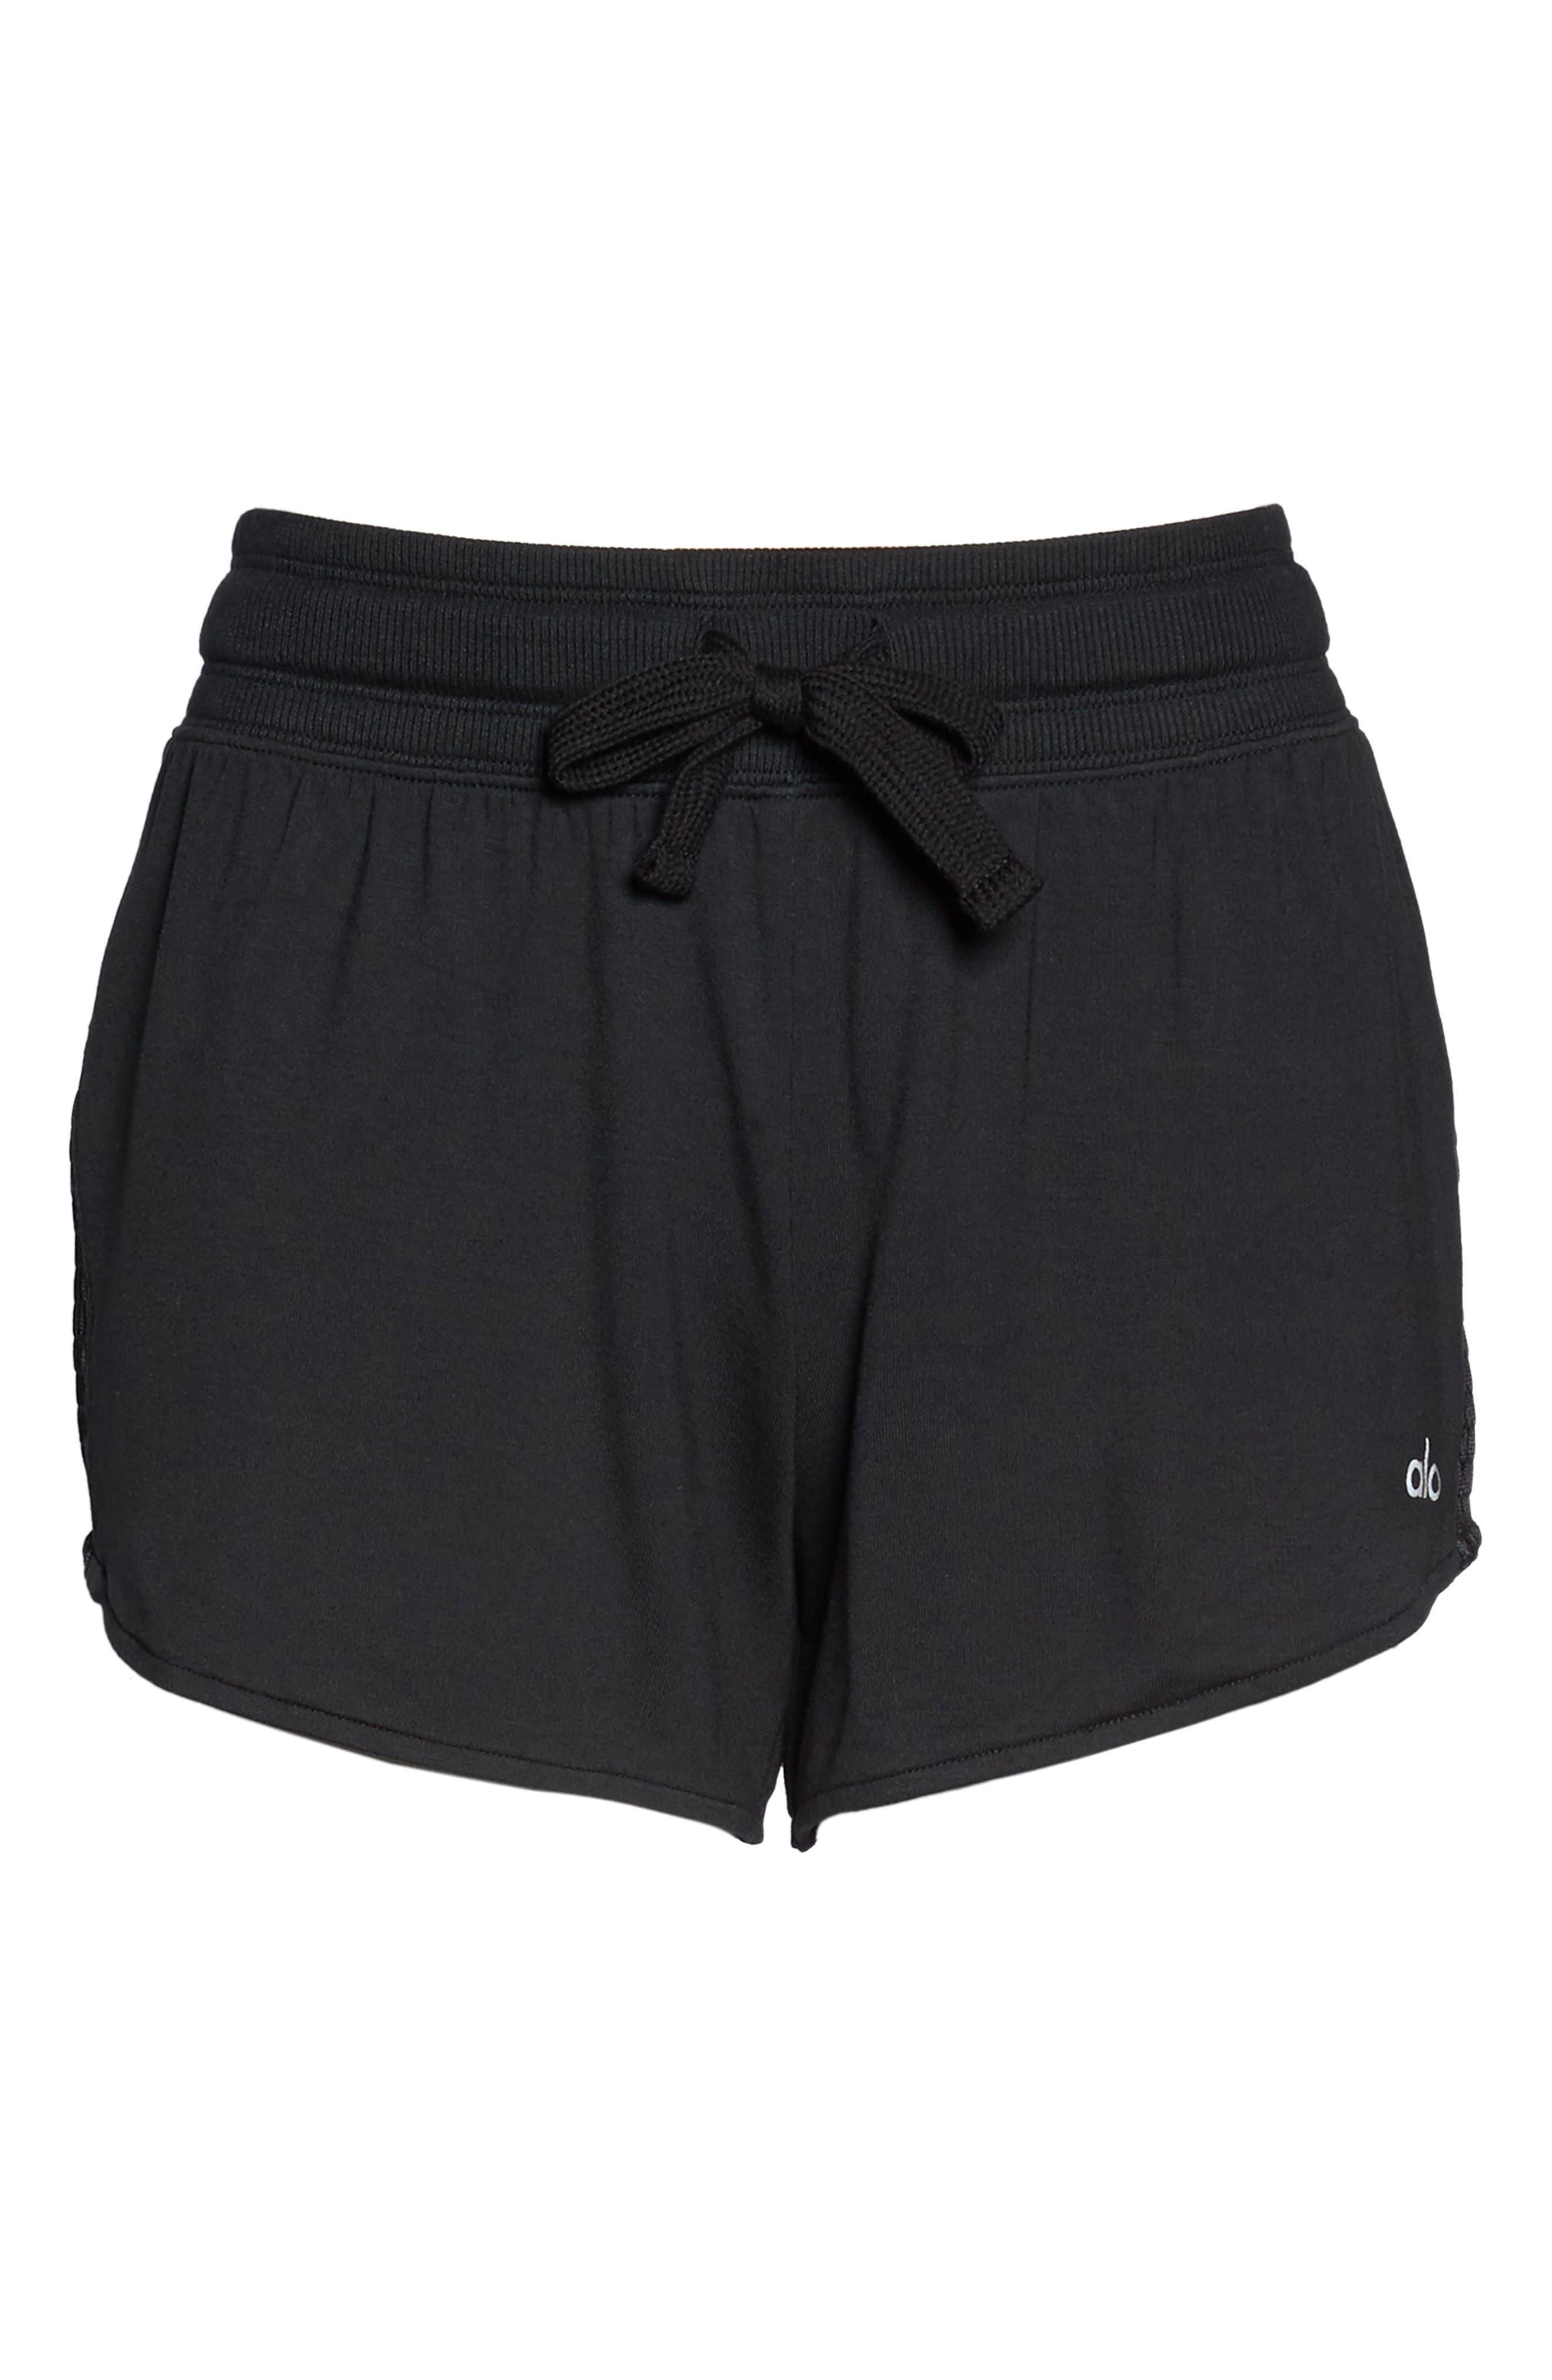 Shade Shorts,                             Alternate thumbnail 7, color,                             Black